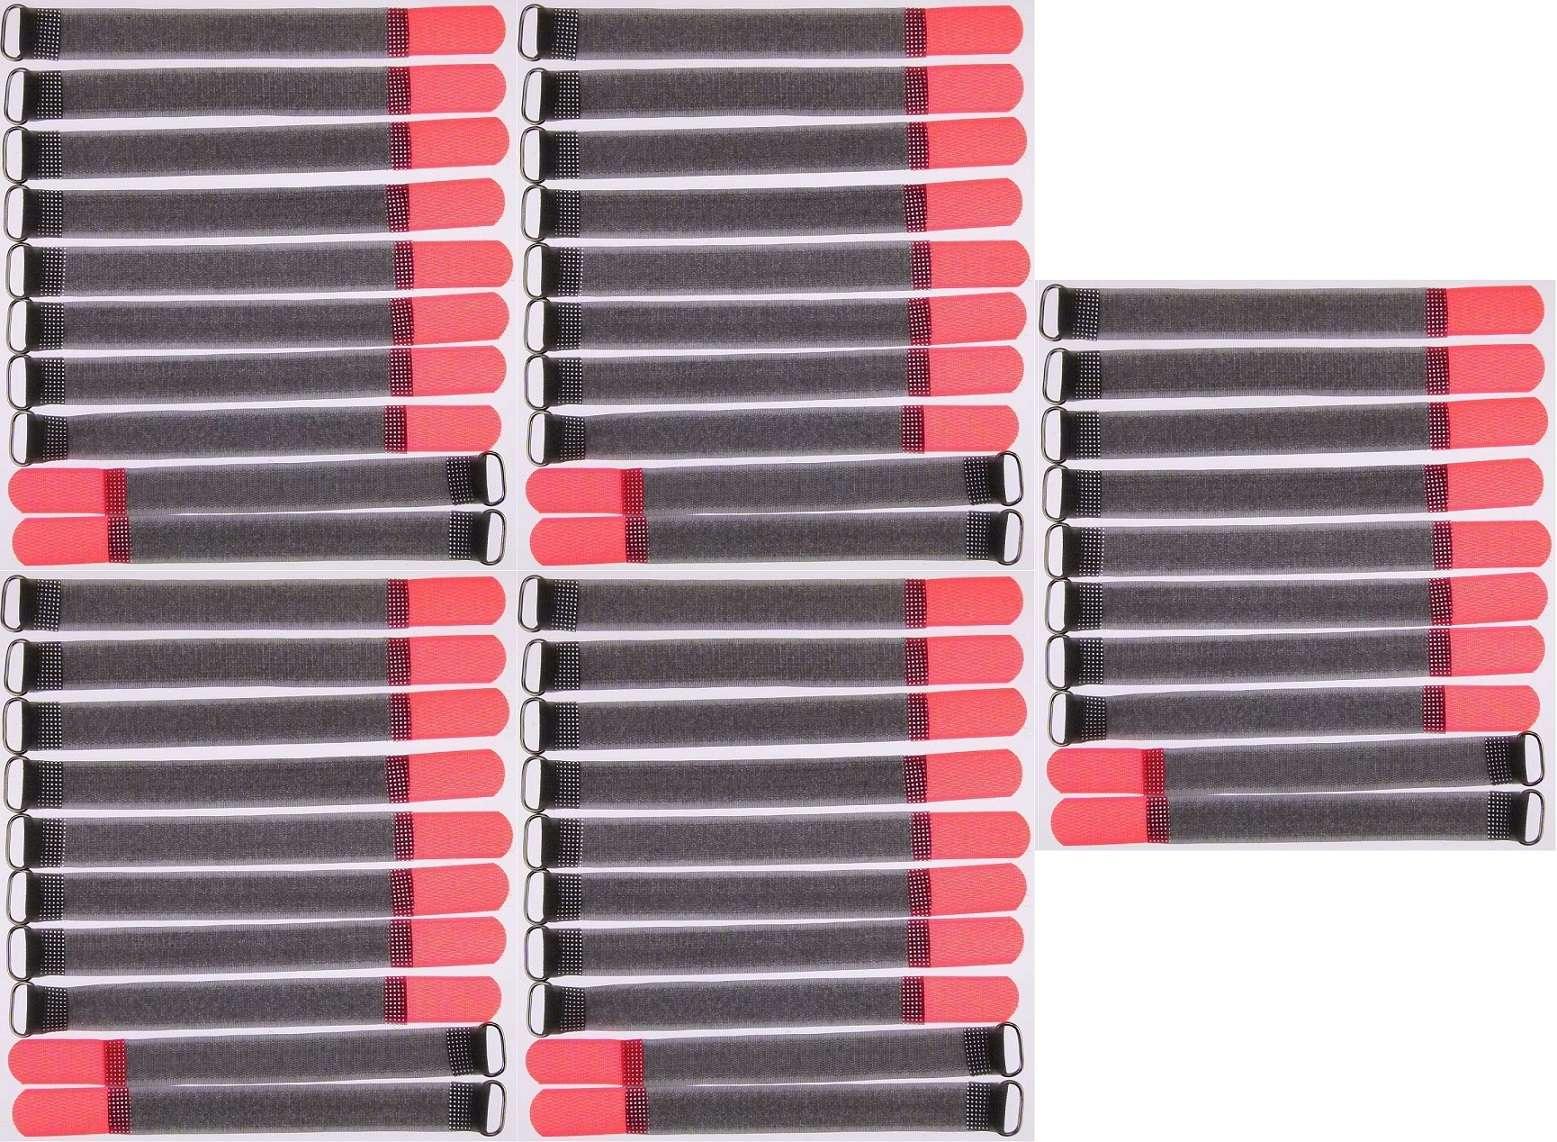 30 Klett Kabelbinder 400 x 40 mm rot Kabelklettband Kabelklett Klettband mit Öse